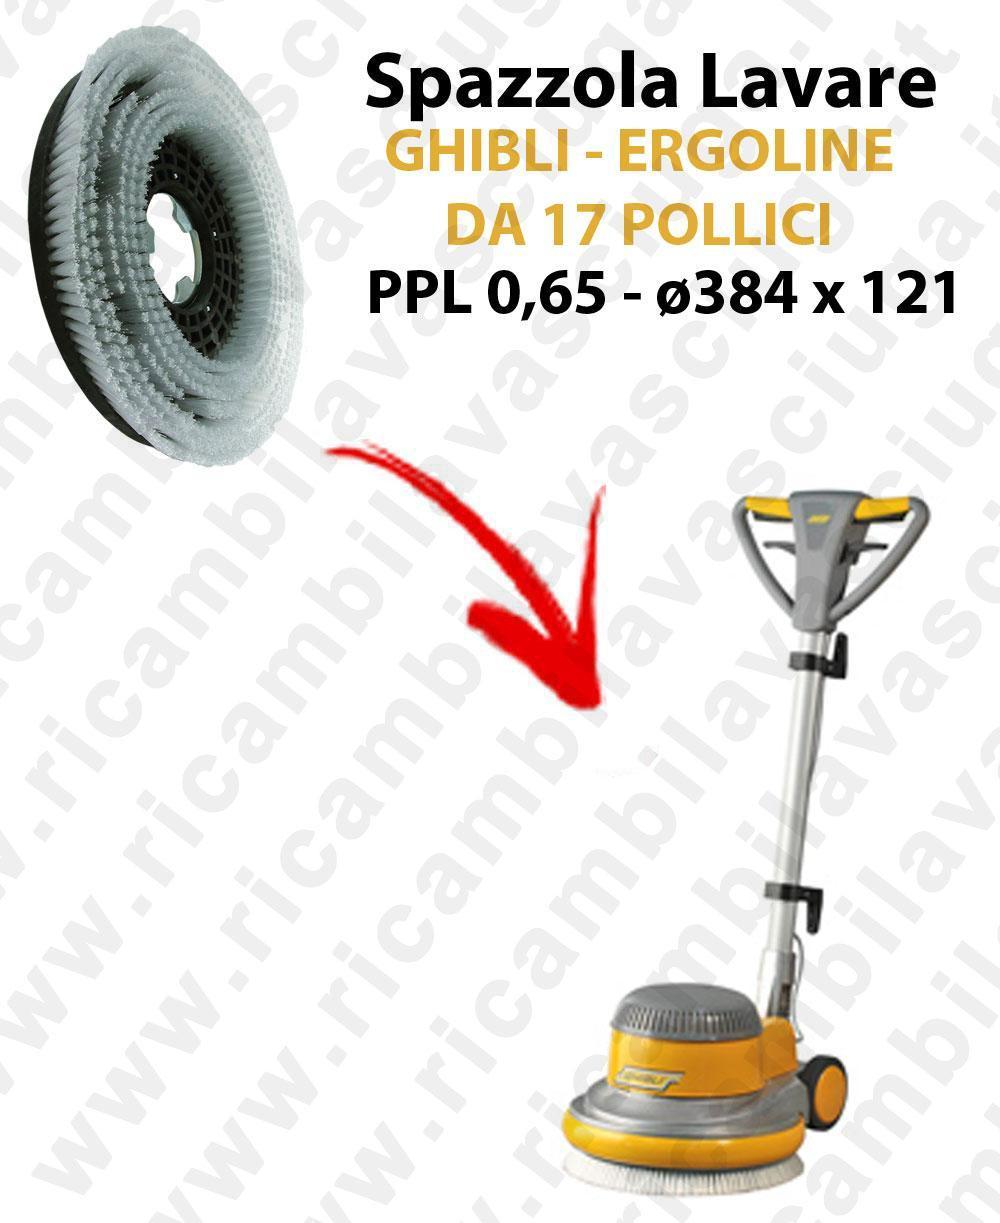 CEPILLO DE LAVADO  para Monodisco GHIBLI  ERGOLINE DA 17 pulgada (SB143). modelo: PPL 0,65  ø384 X 121